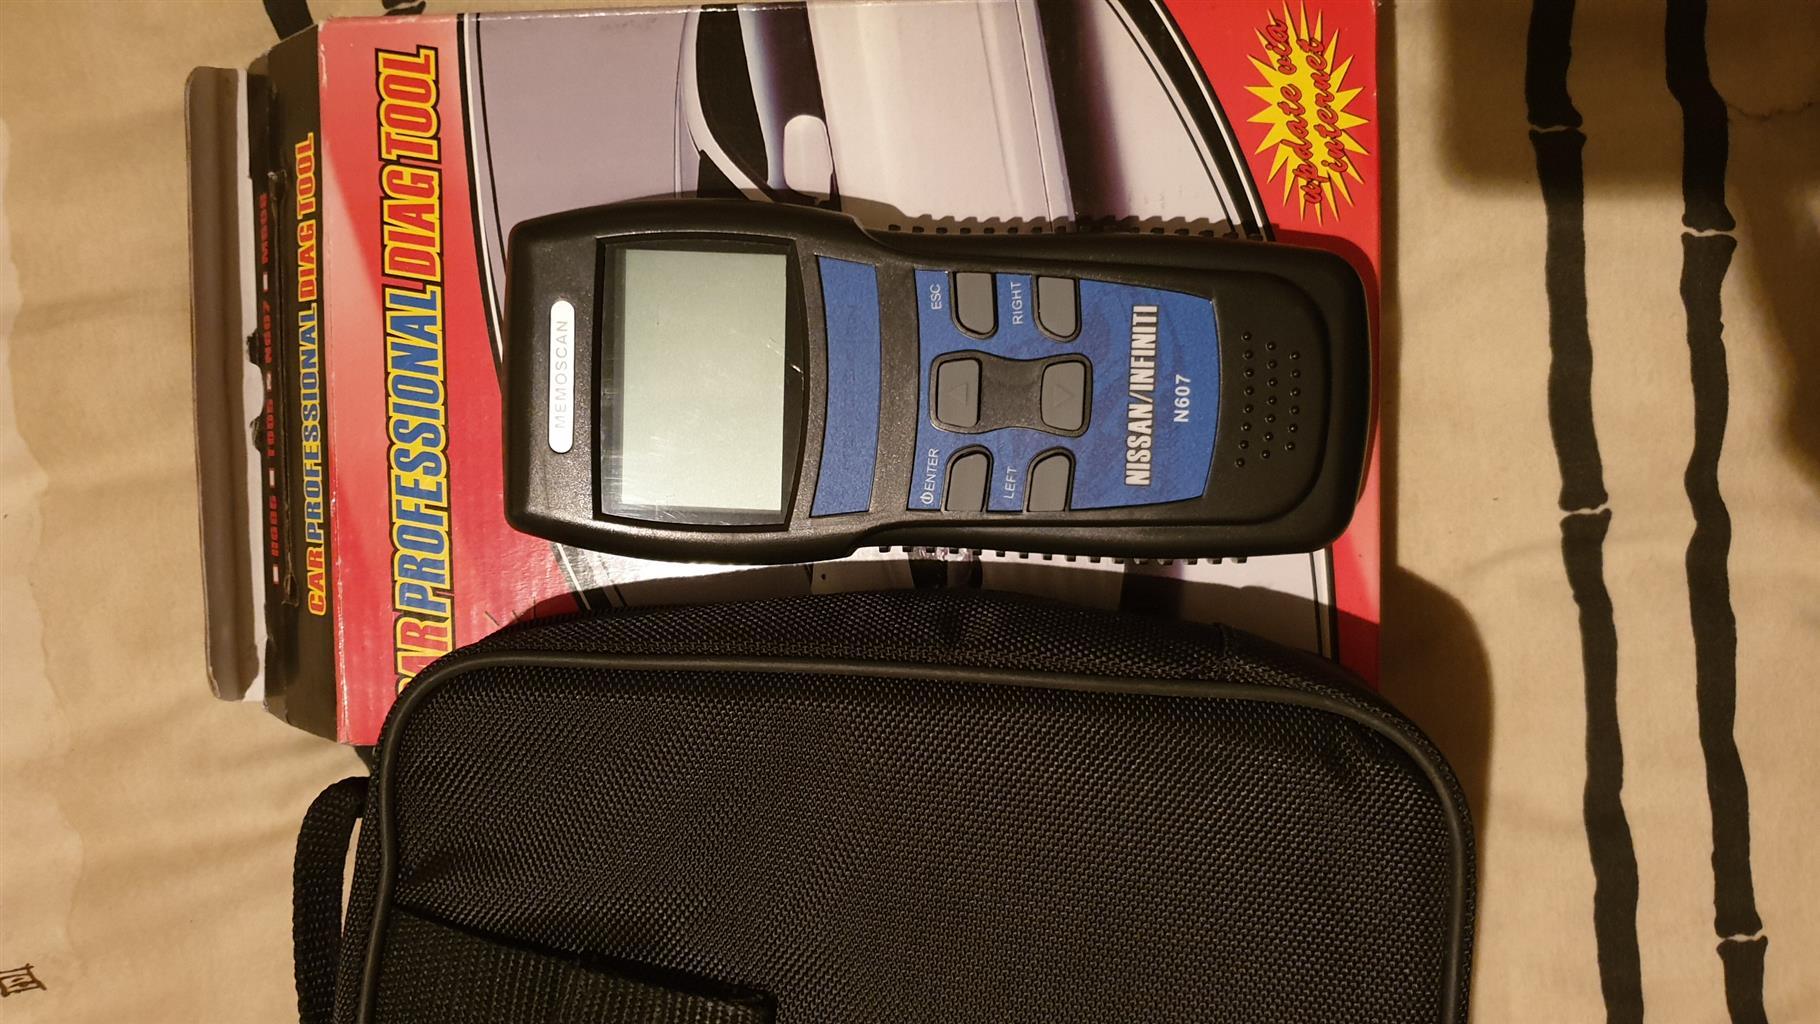 Universal OBD2 hand held diagnostic scan tool U600